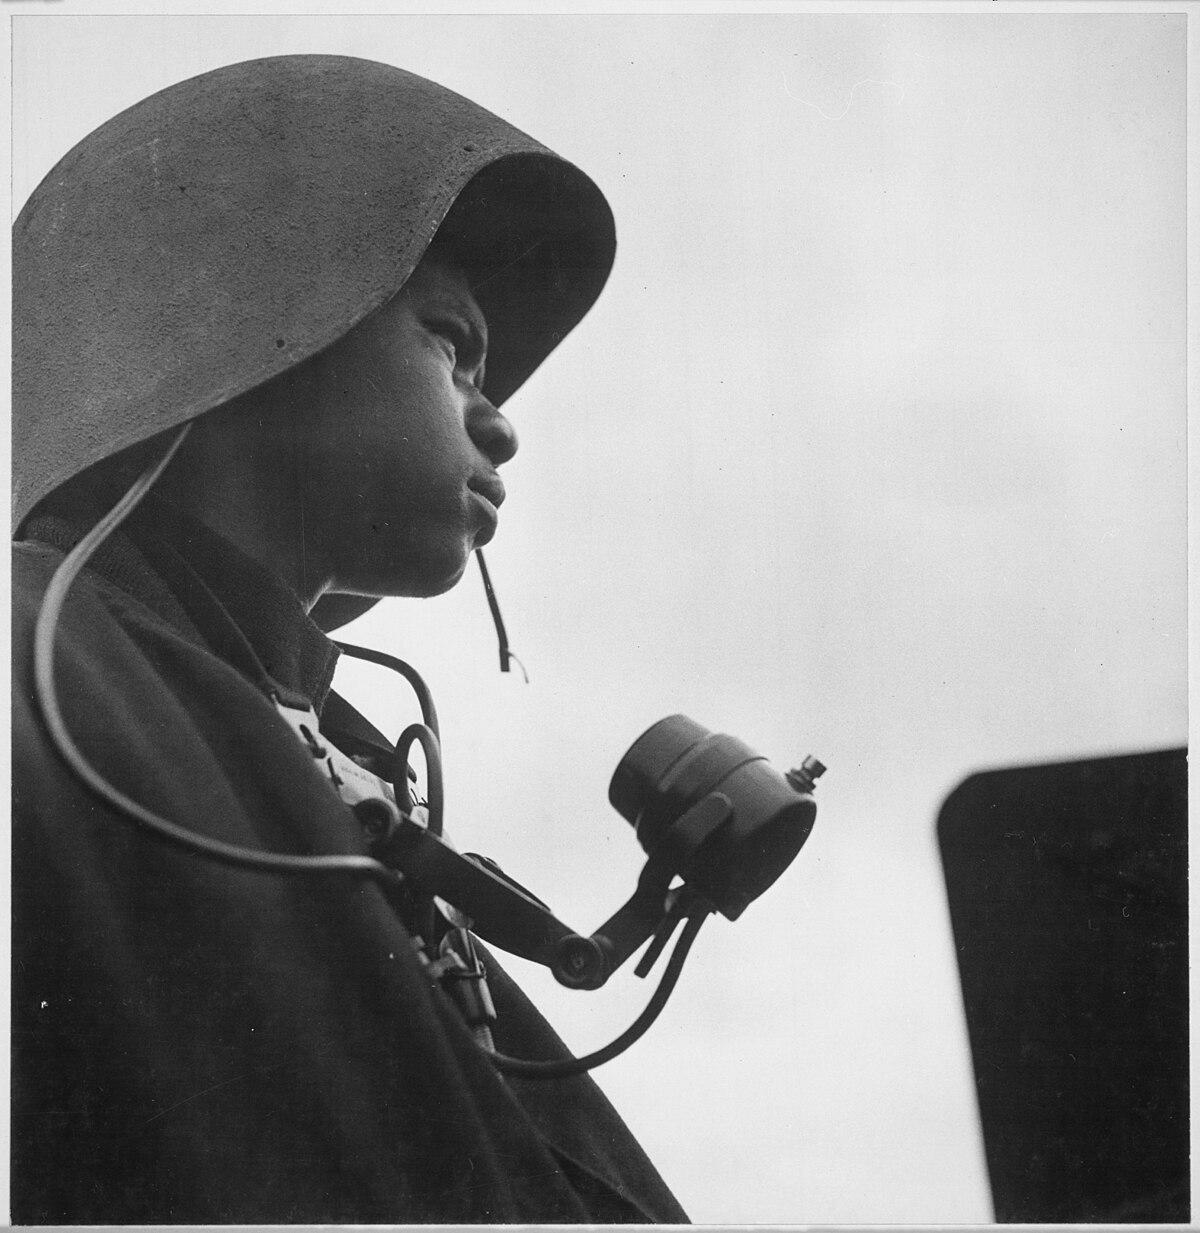 "File:""Richard Salter, CK 3-c, a talker of a gun station, aboard the U.S.S. Tulagi (CVE-72) off the coast of southern France."" - NARA - 520858.jpg - Wikimedia Commons"